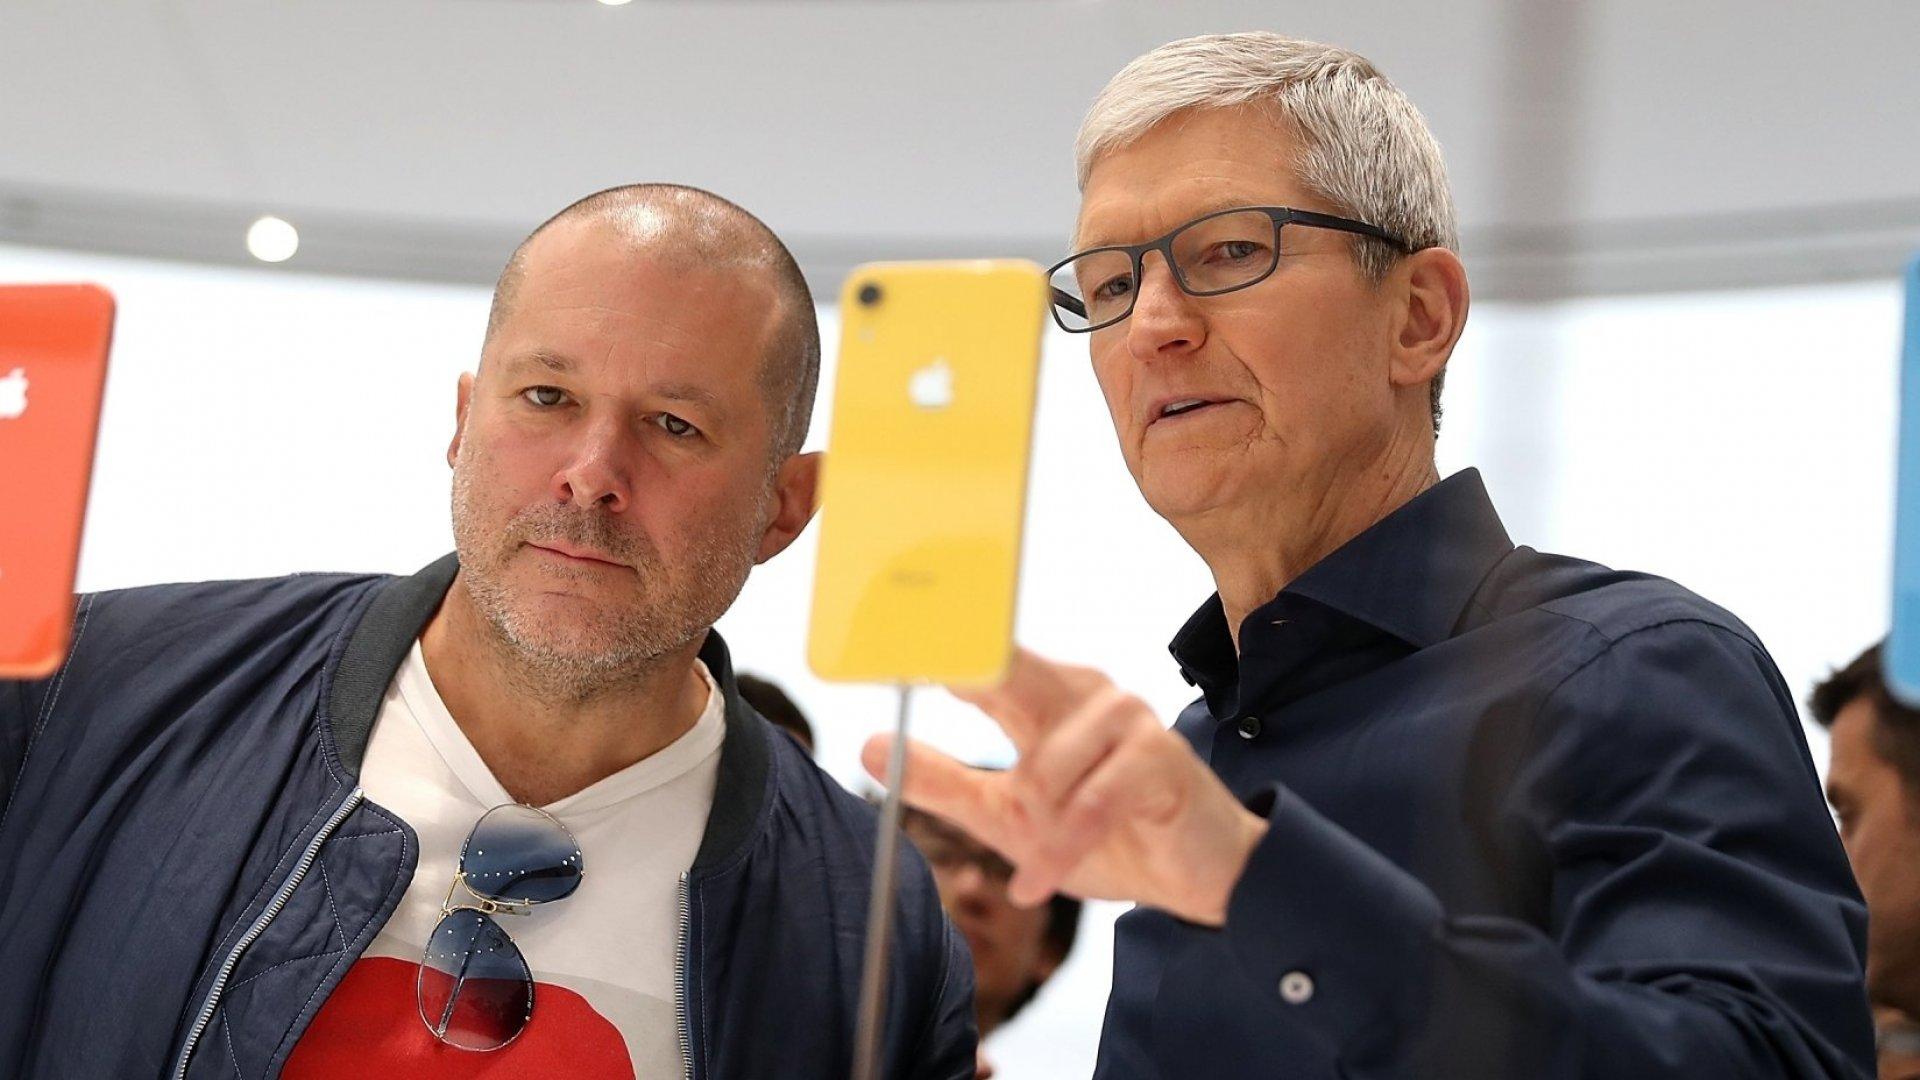 Jony Ive with Apple CEO Tim Cook.